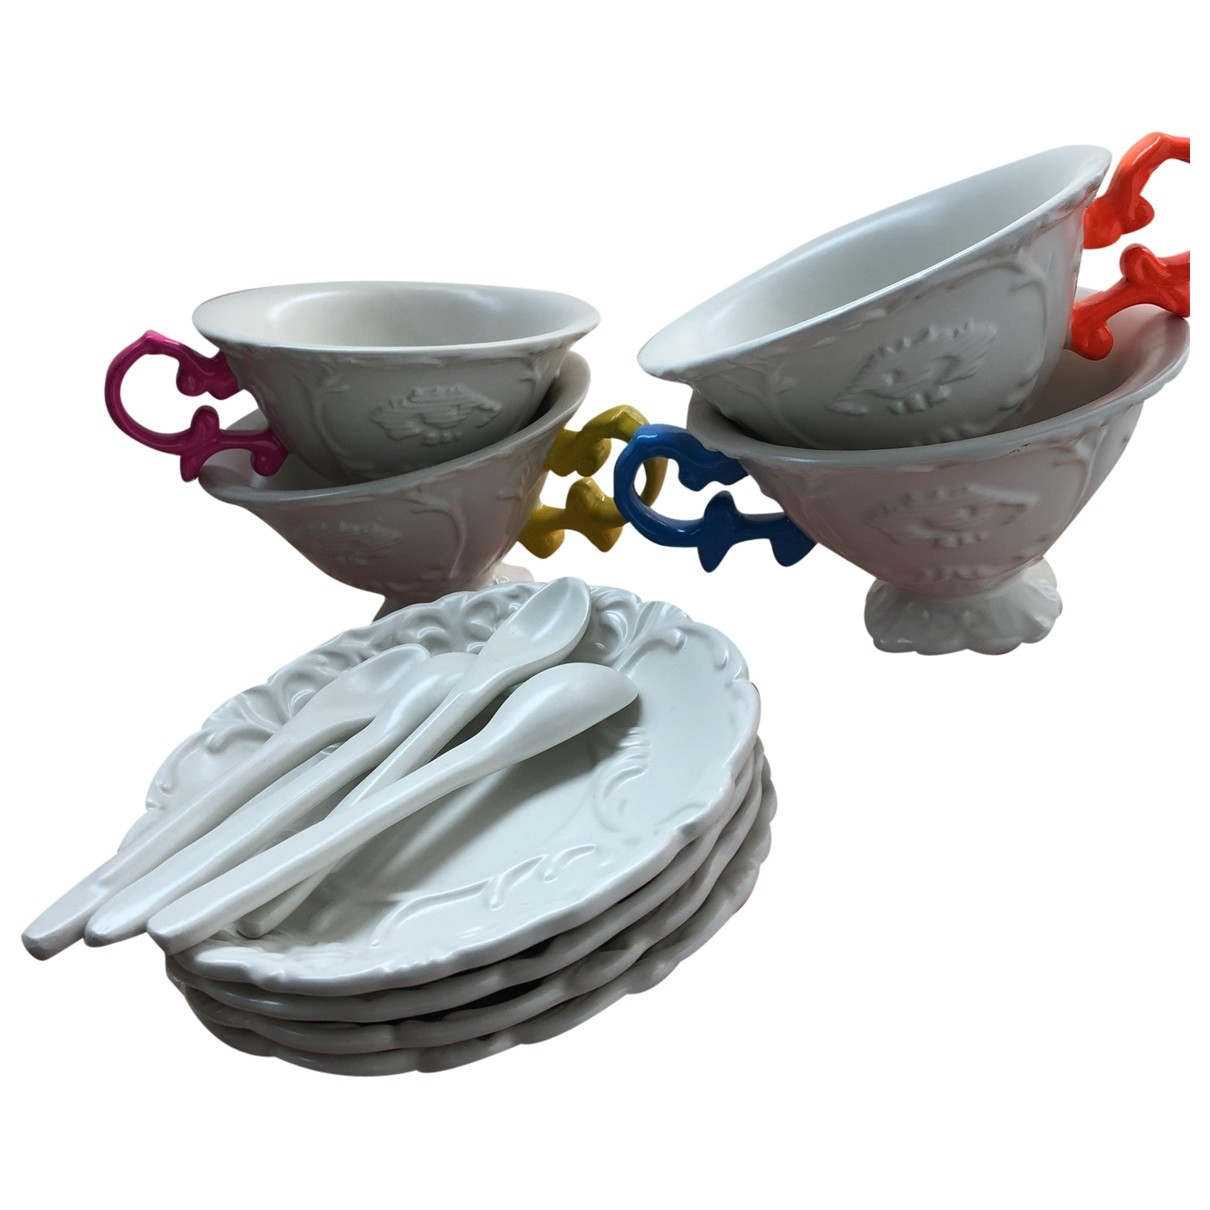 Juego de te/cafe de Ceramica Seletti